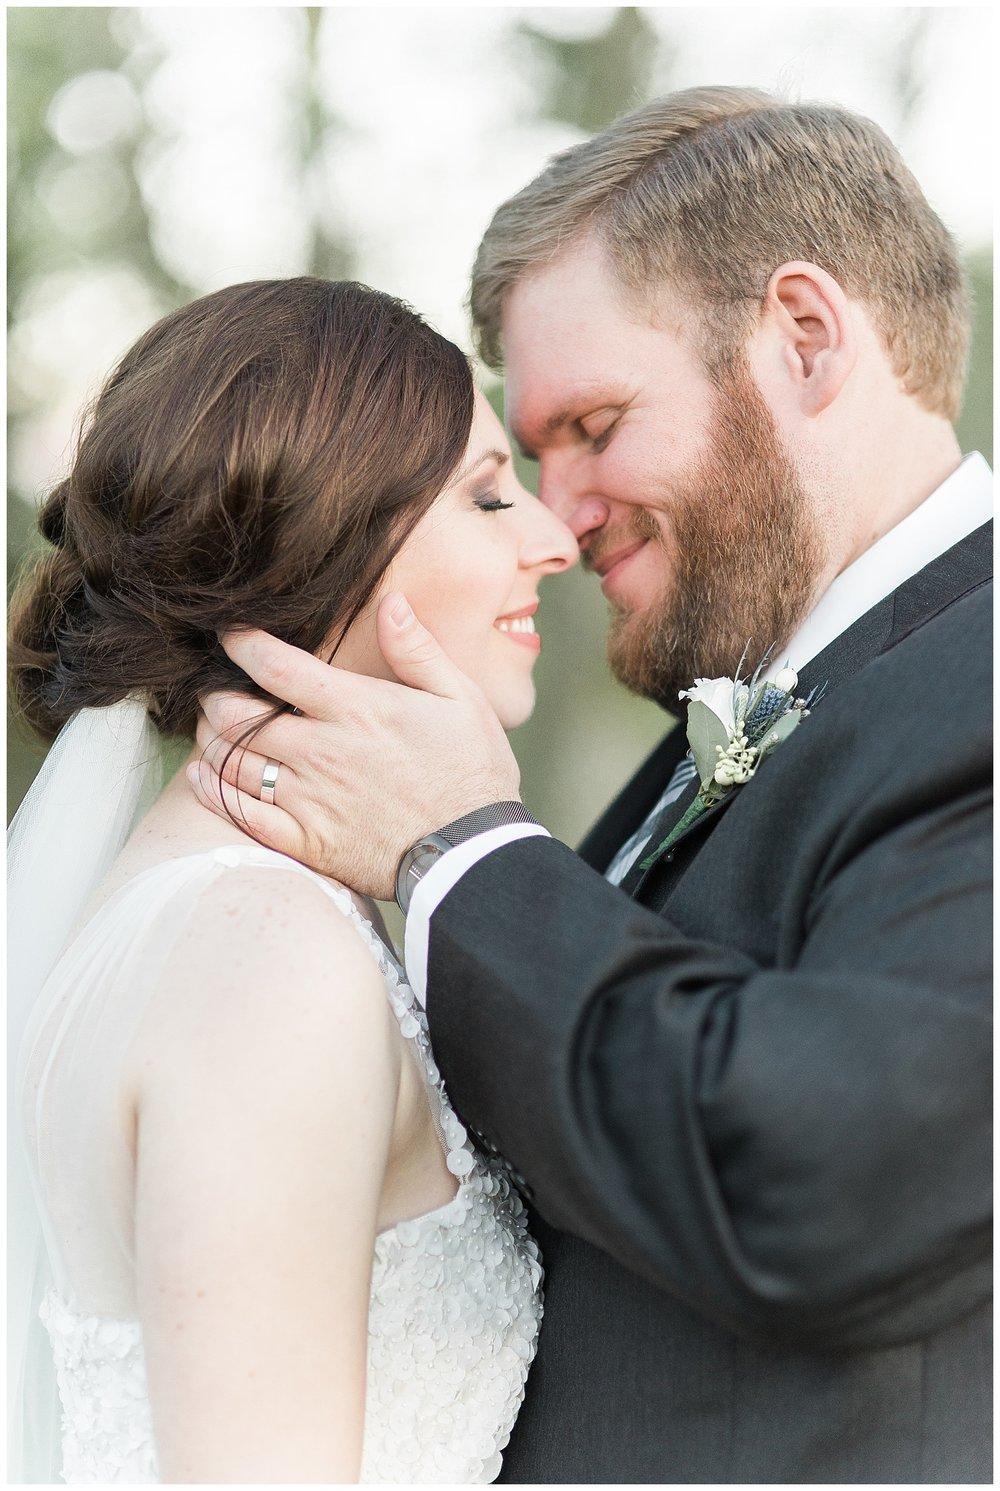 everleigh-photography-pyramid-hill-sculpture-park-cincinnati-wedding-photographer-the-faller-wedding-41